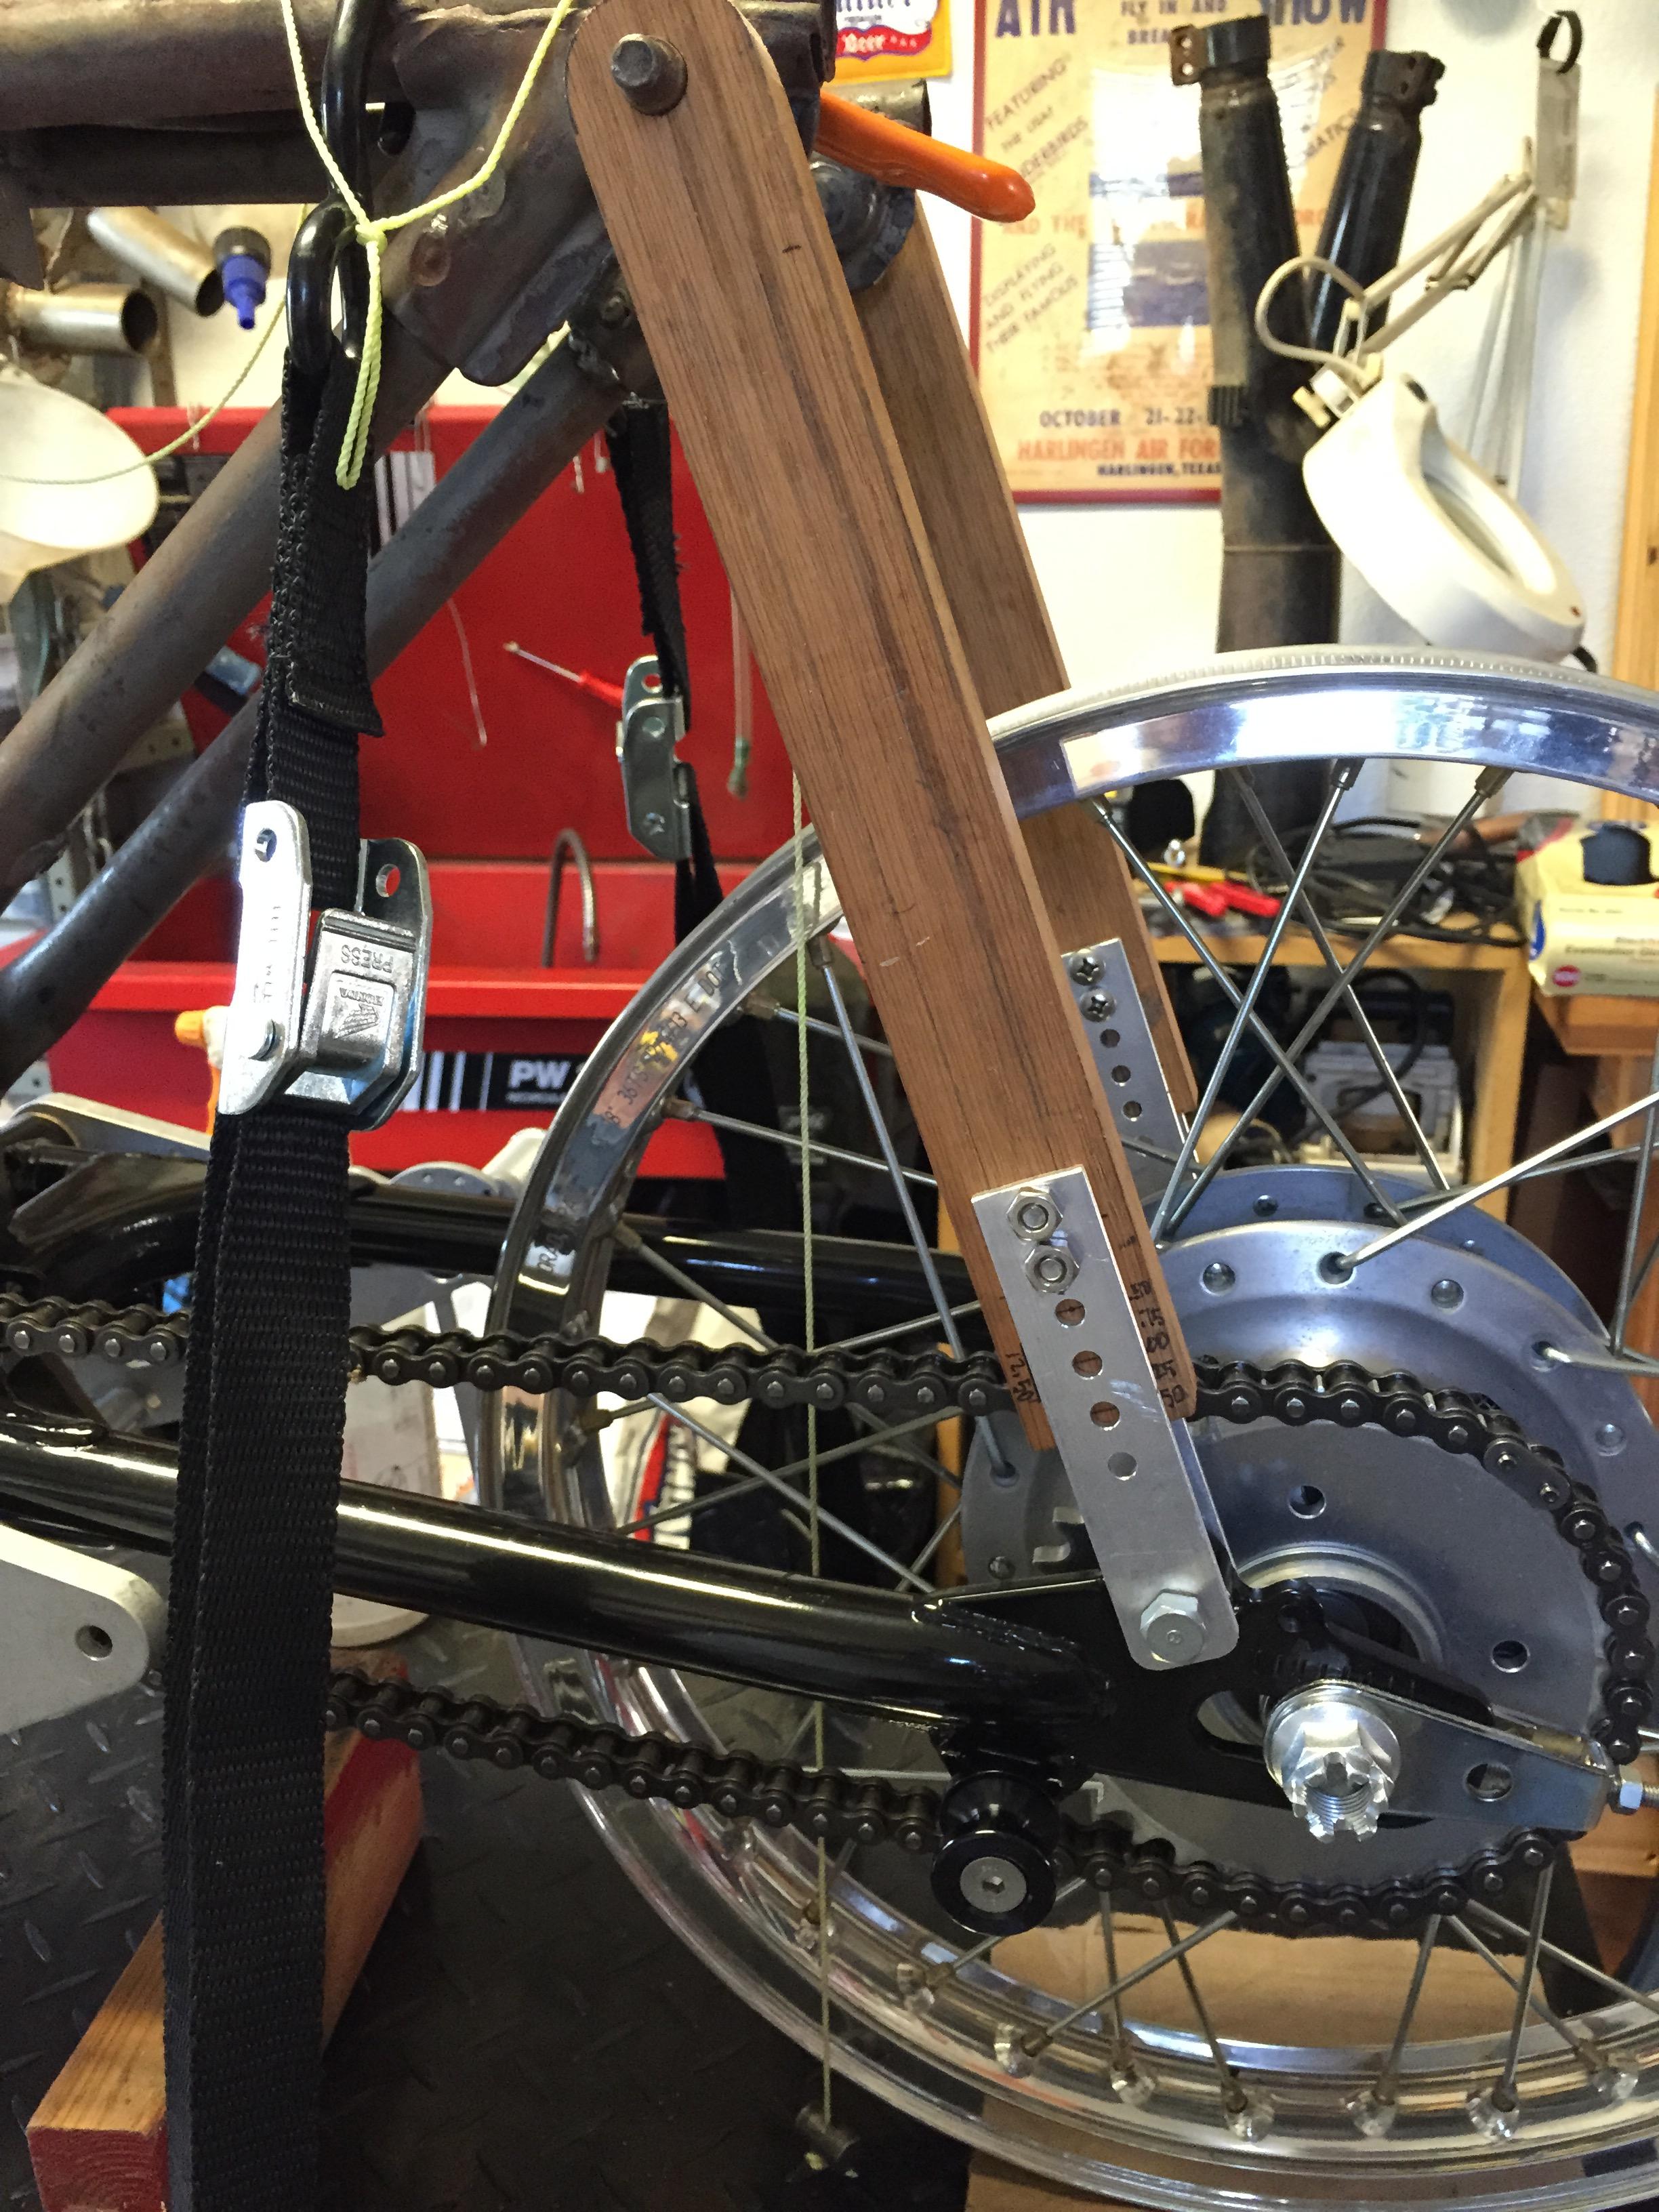 1968 Cl175 Race Bike Build 1970 Honda Ct70 Valve Guide 457